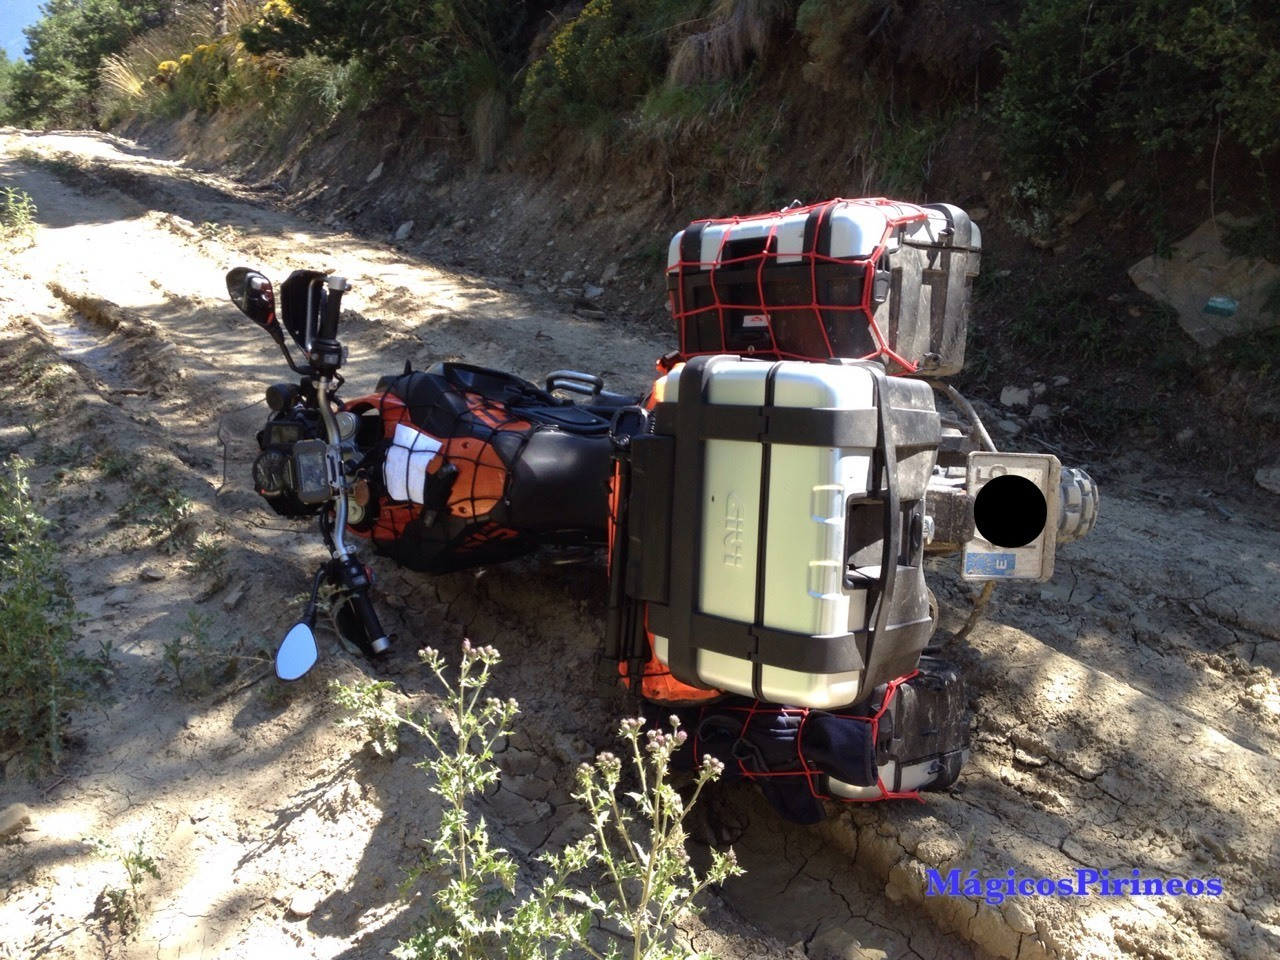 Transpirenaica Día 5 Última etapa de Broto a Hondarribia. bit.ly/2eE9oc5